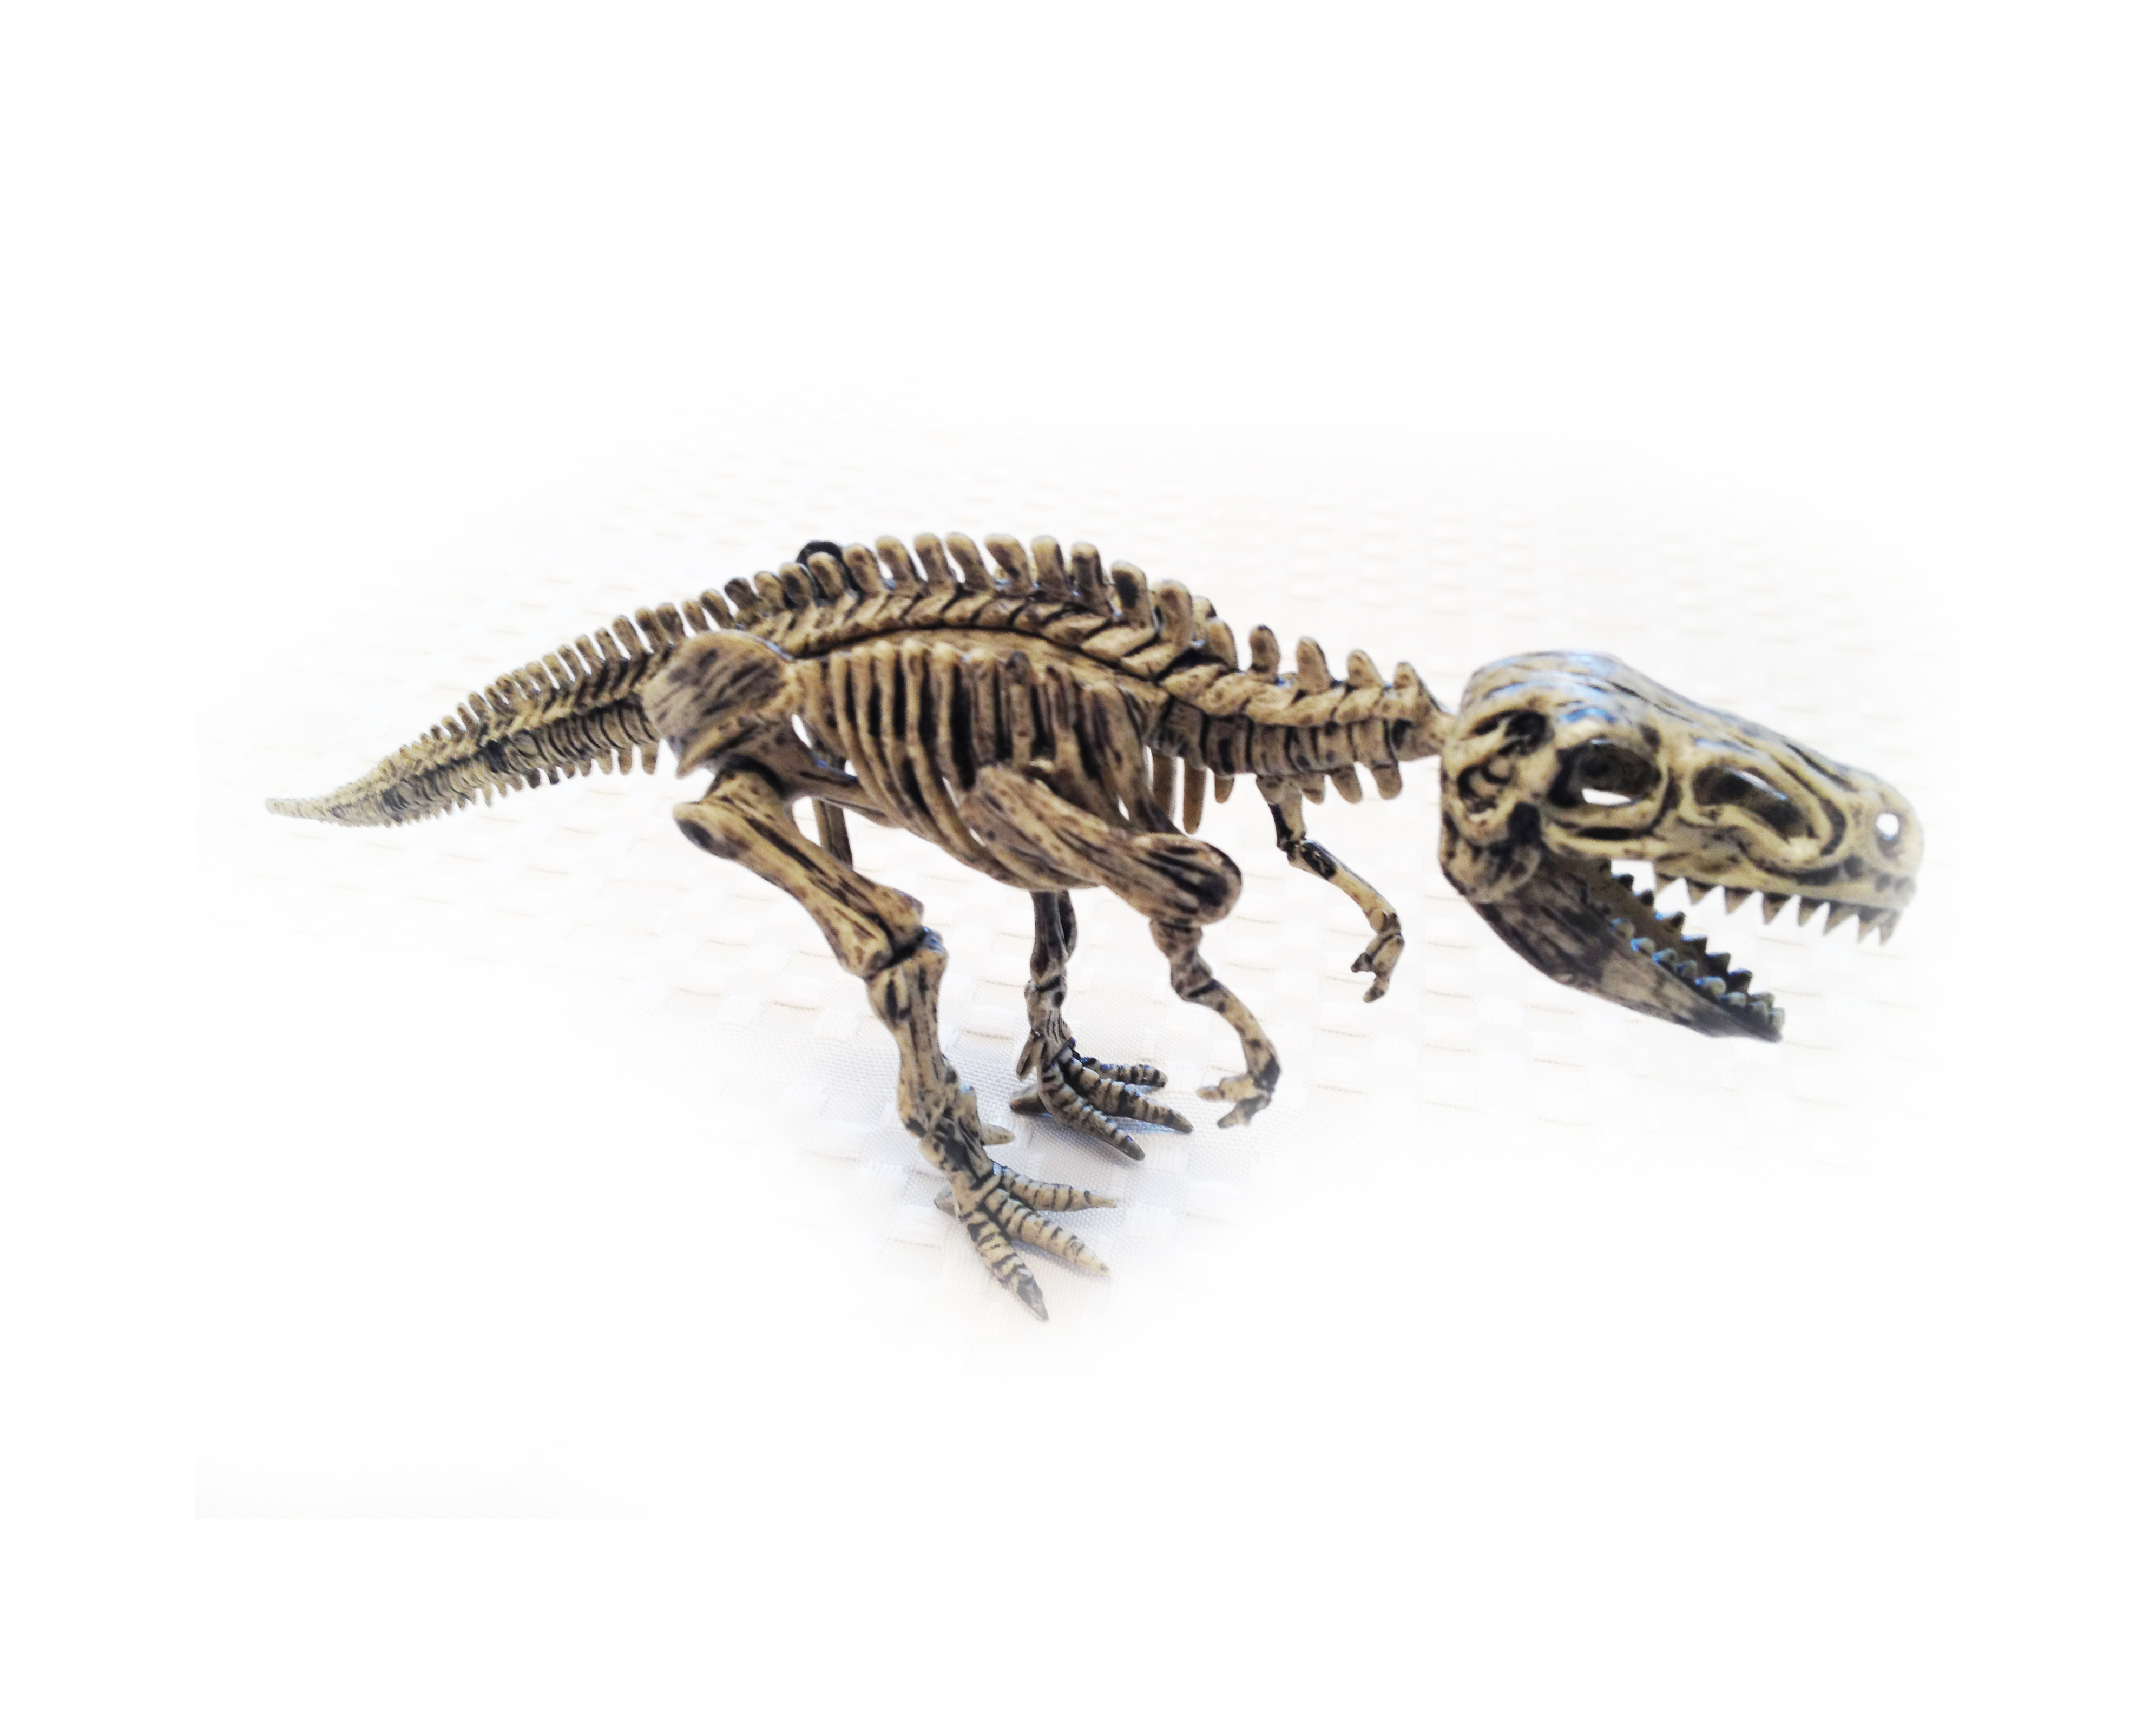 TYRANNOSAURUS / T-REX: Dinosaur Excavation Kit -- Dig out